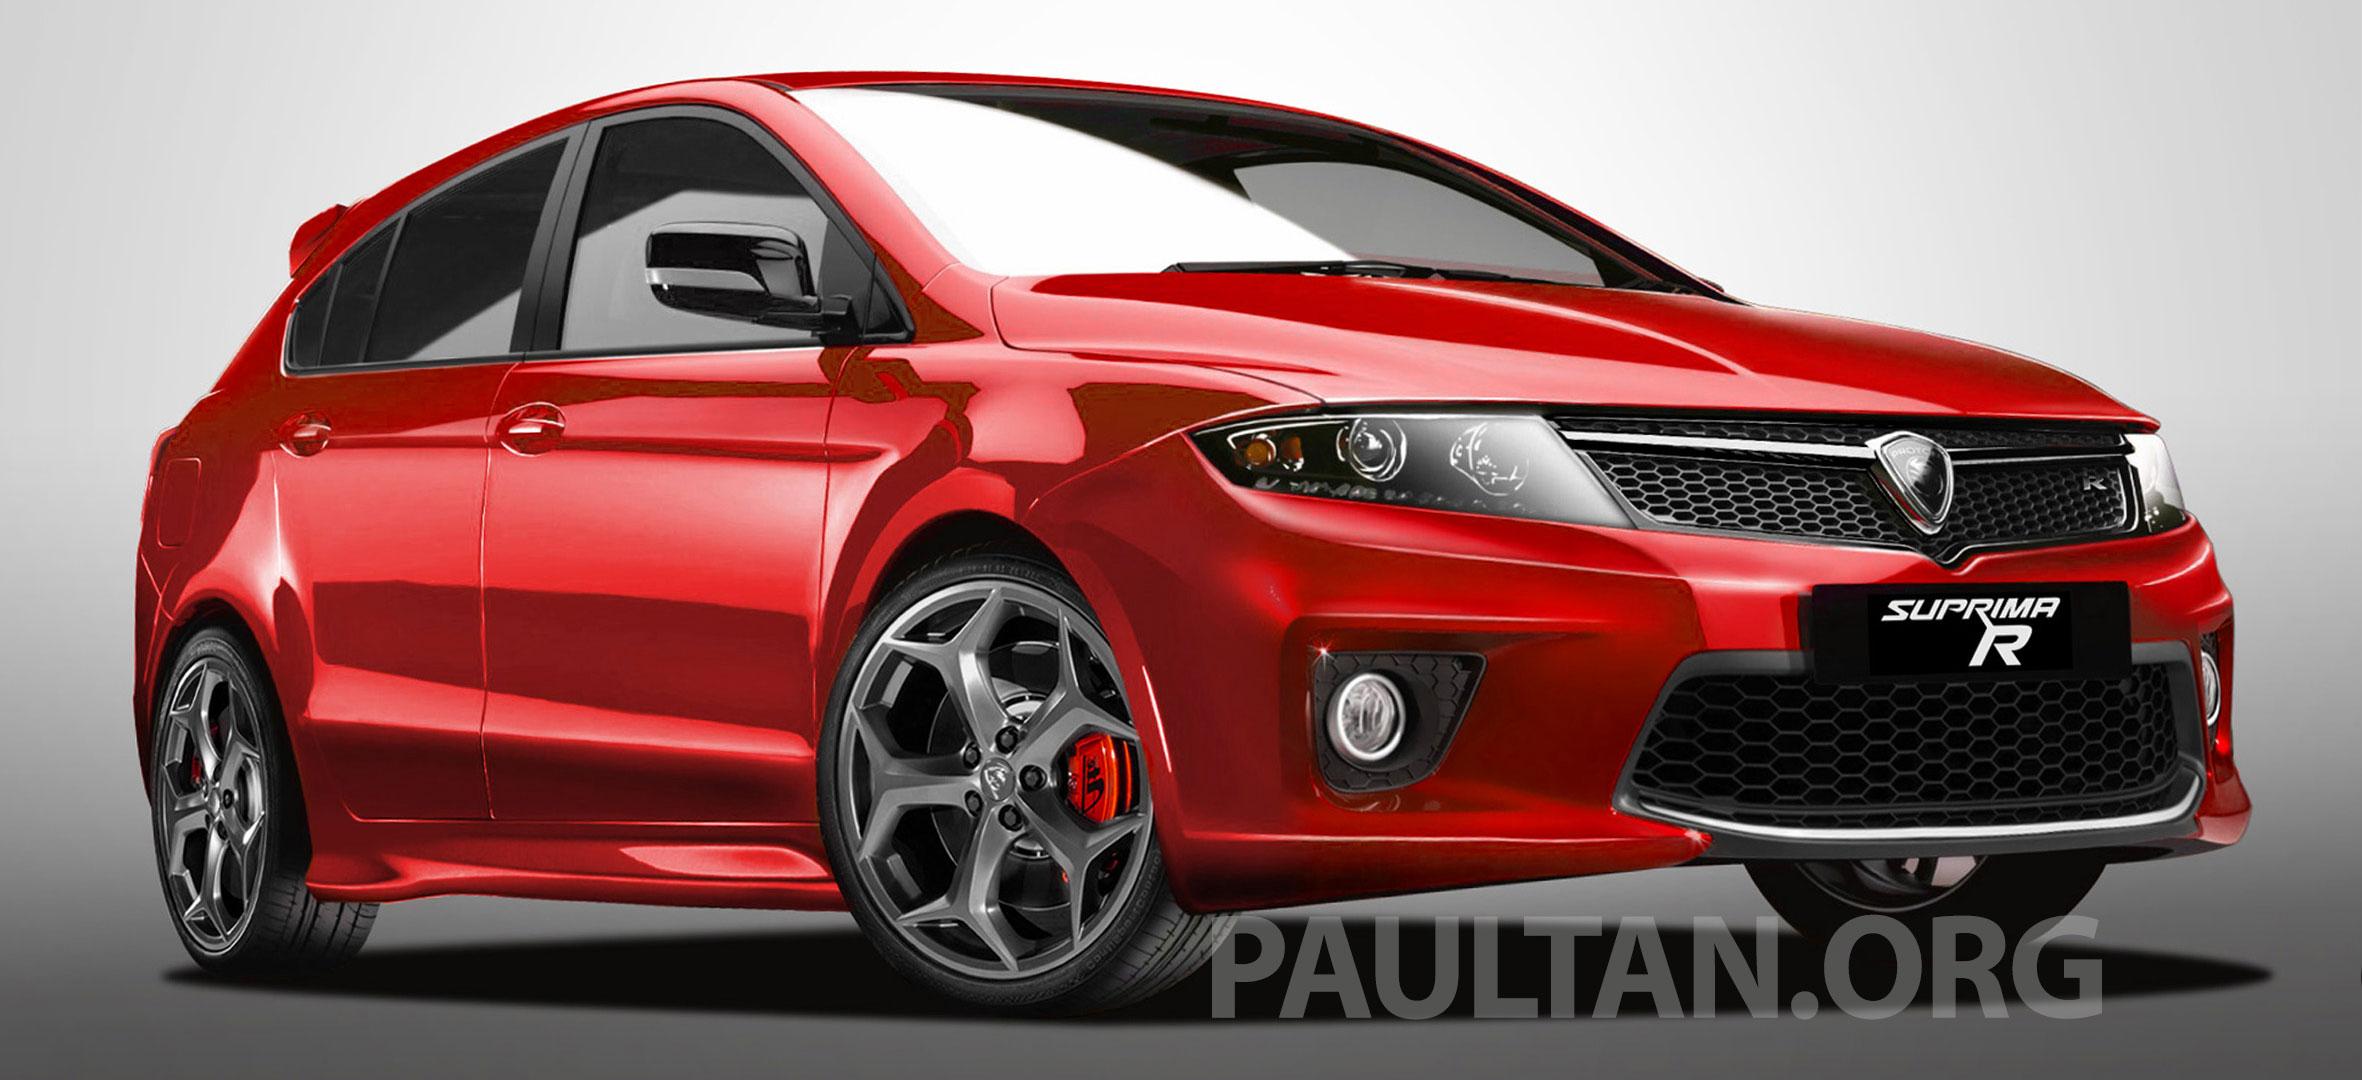 Proton Suprima R Concept Unofficial Rendering Paul Tan